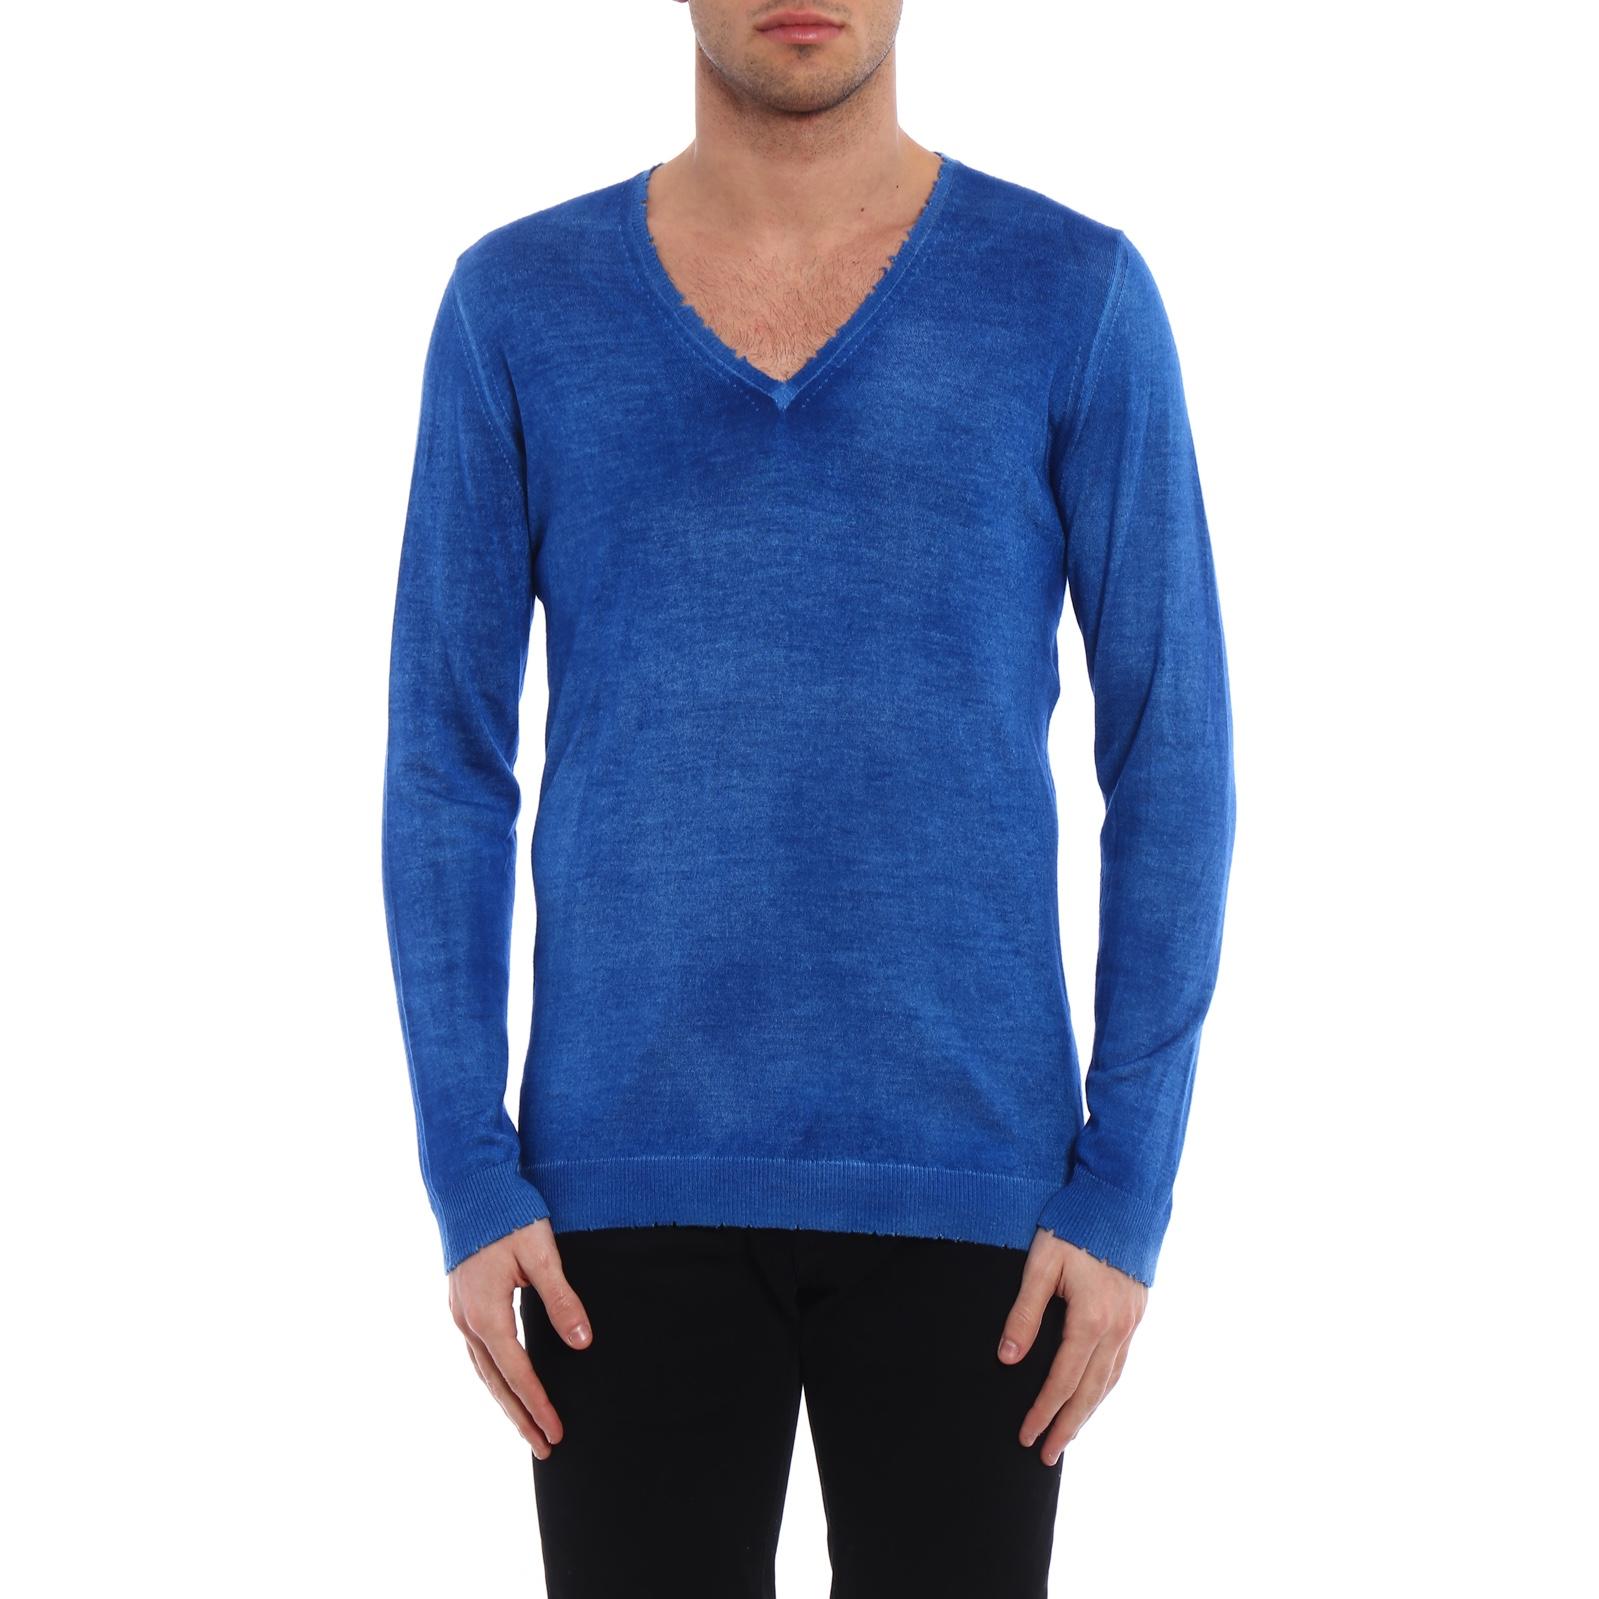 iKRIX-avant-toi-v-necks-cashmere-and-silk-destroyed-sweater-00000121334f00s013.jpg